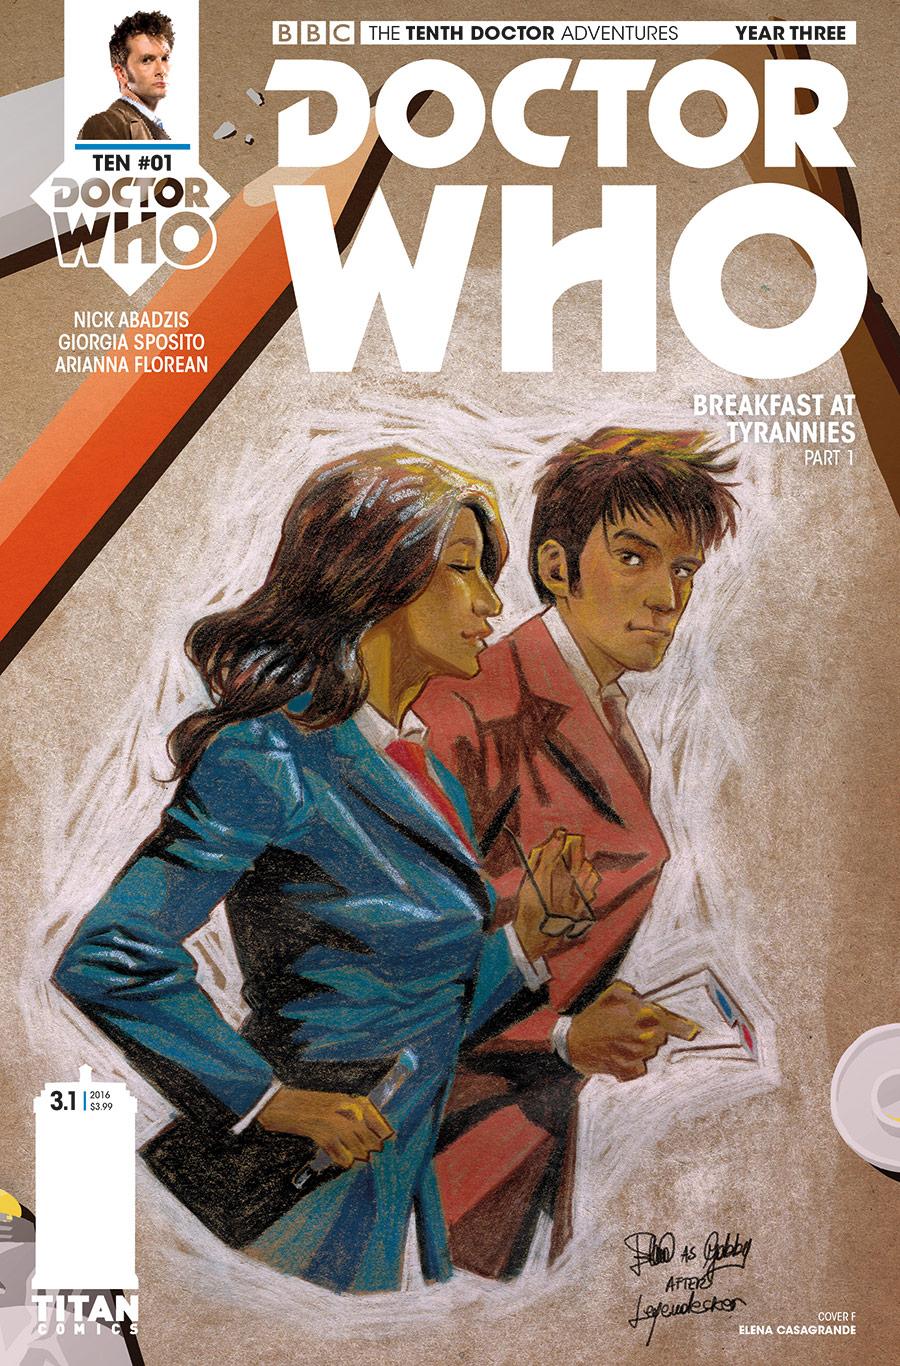 TENTH DOCTOR YEAR THREE #1 Cover_F_Elena_Casagrande (Credit: Titan)